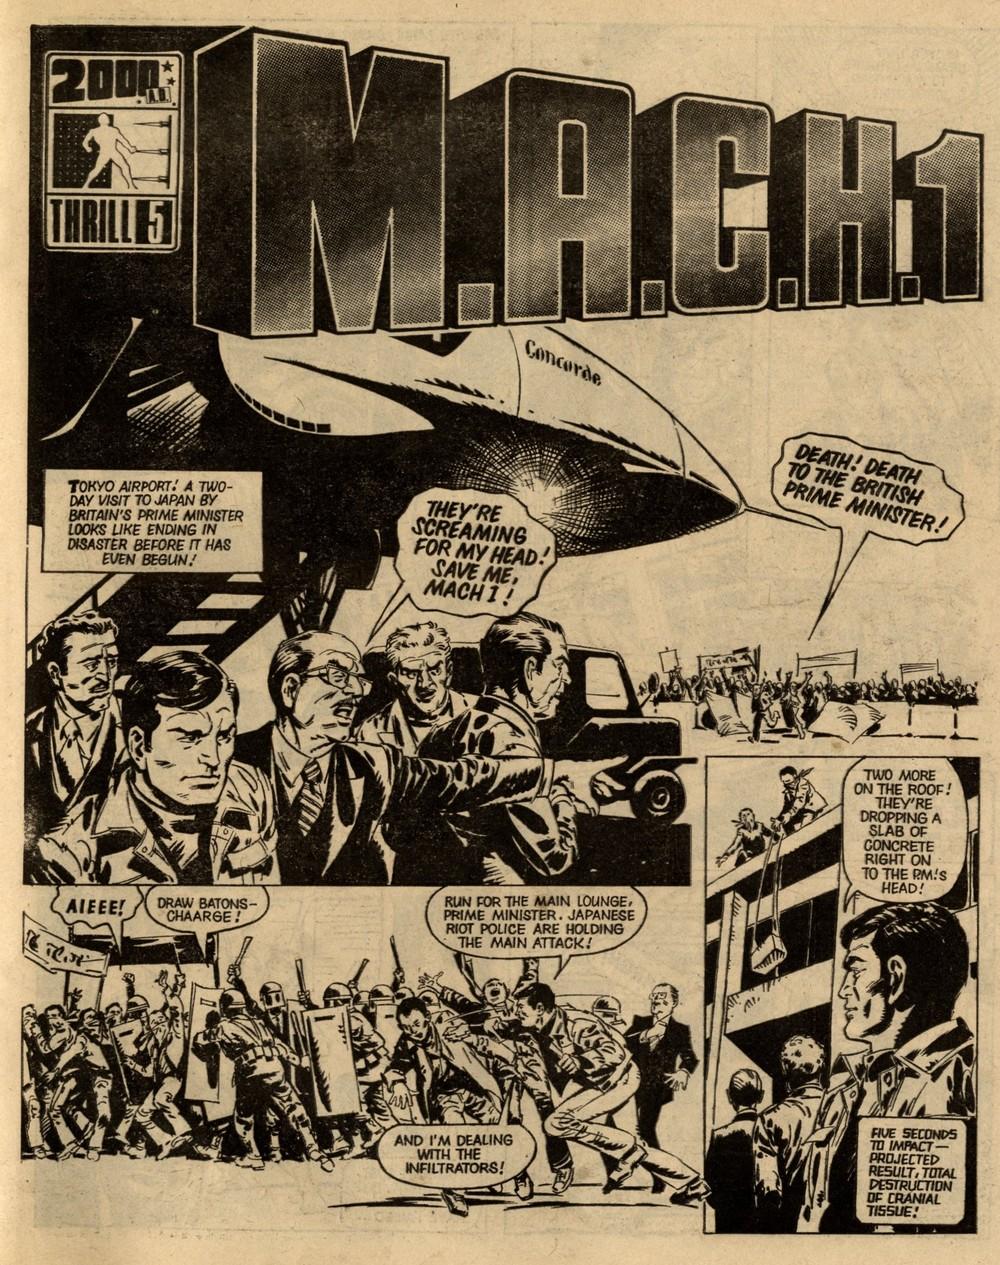 M.A.C.H.1: Steve MacManus (writer), Lopez (artist)